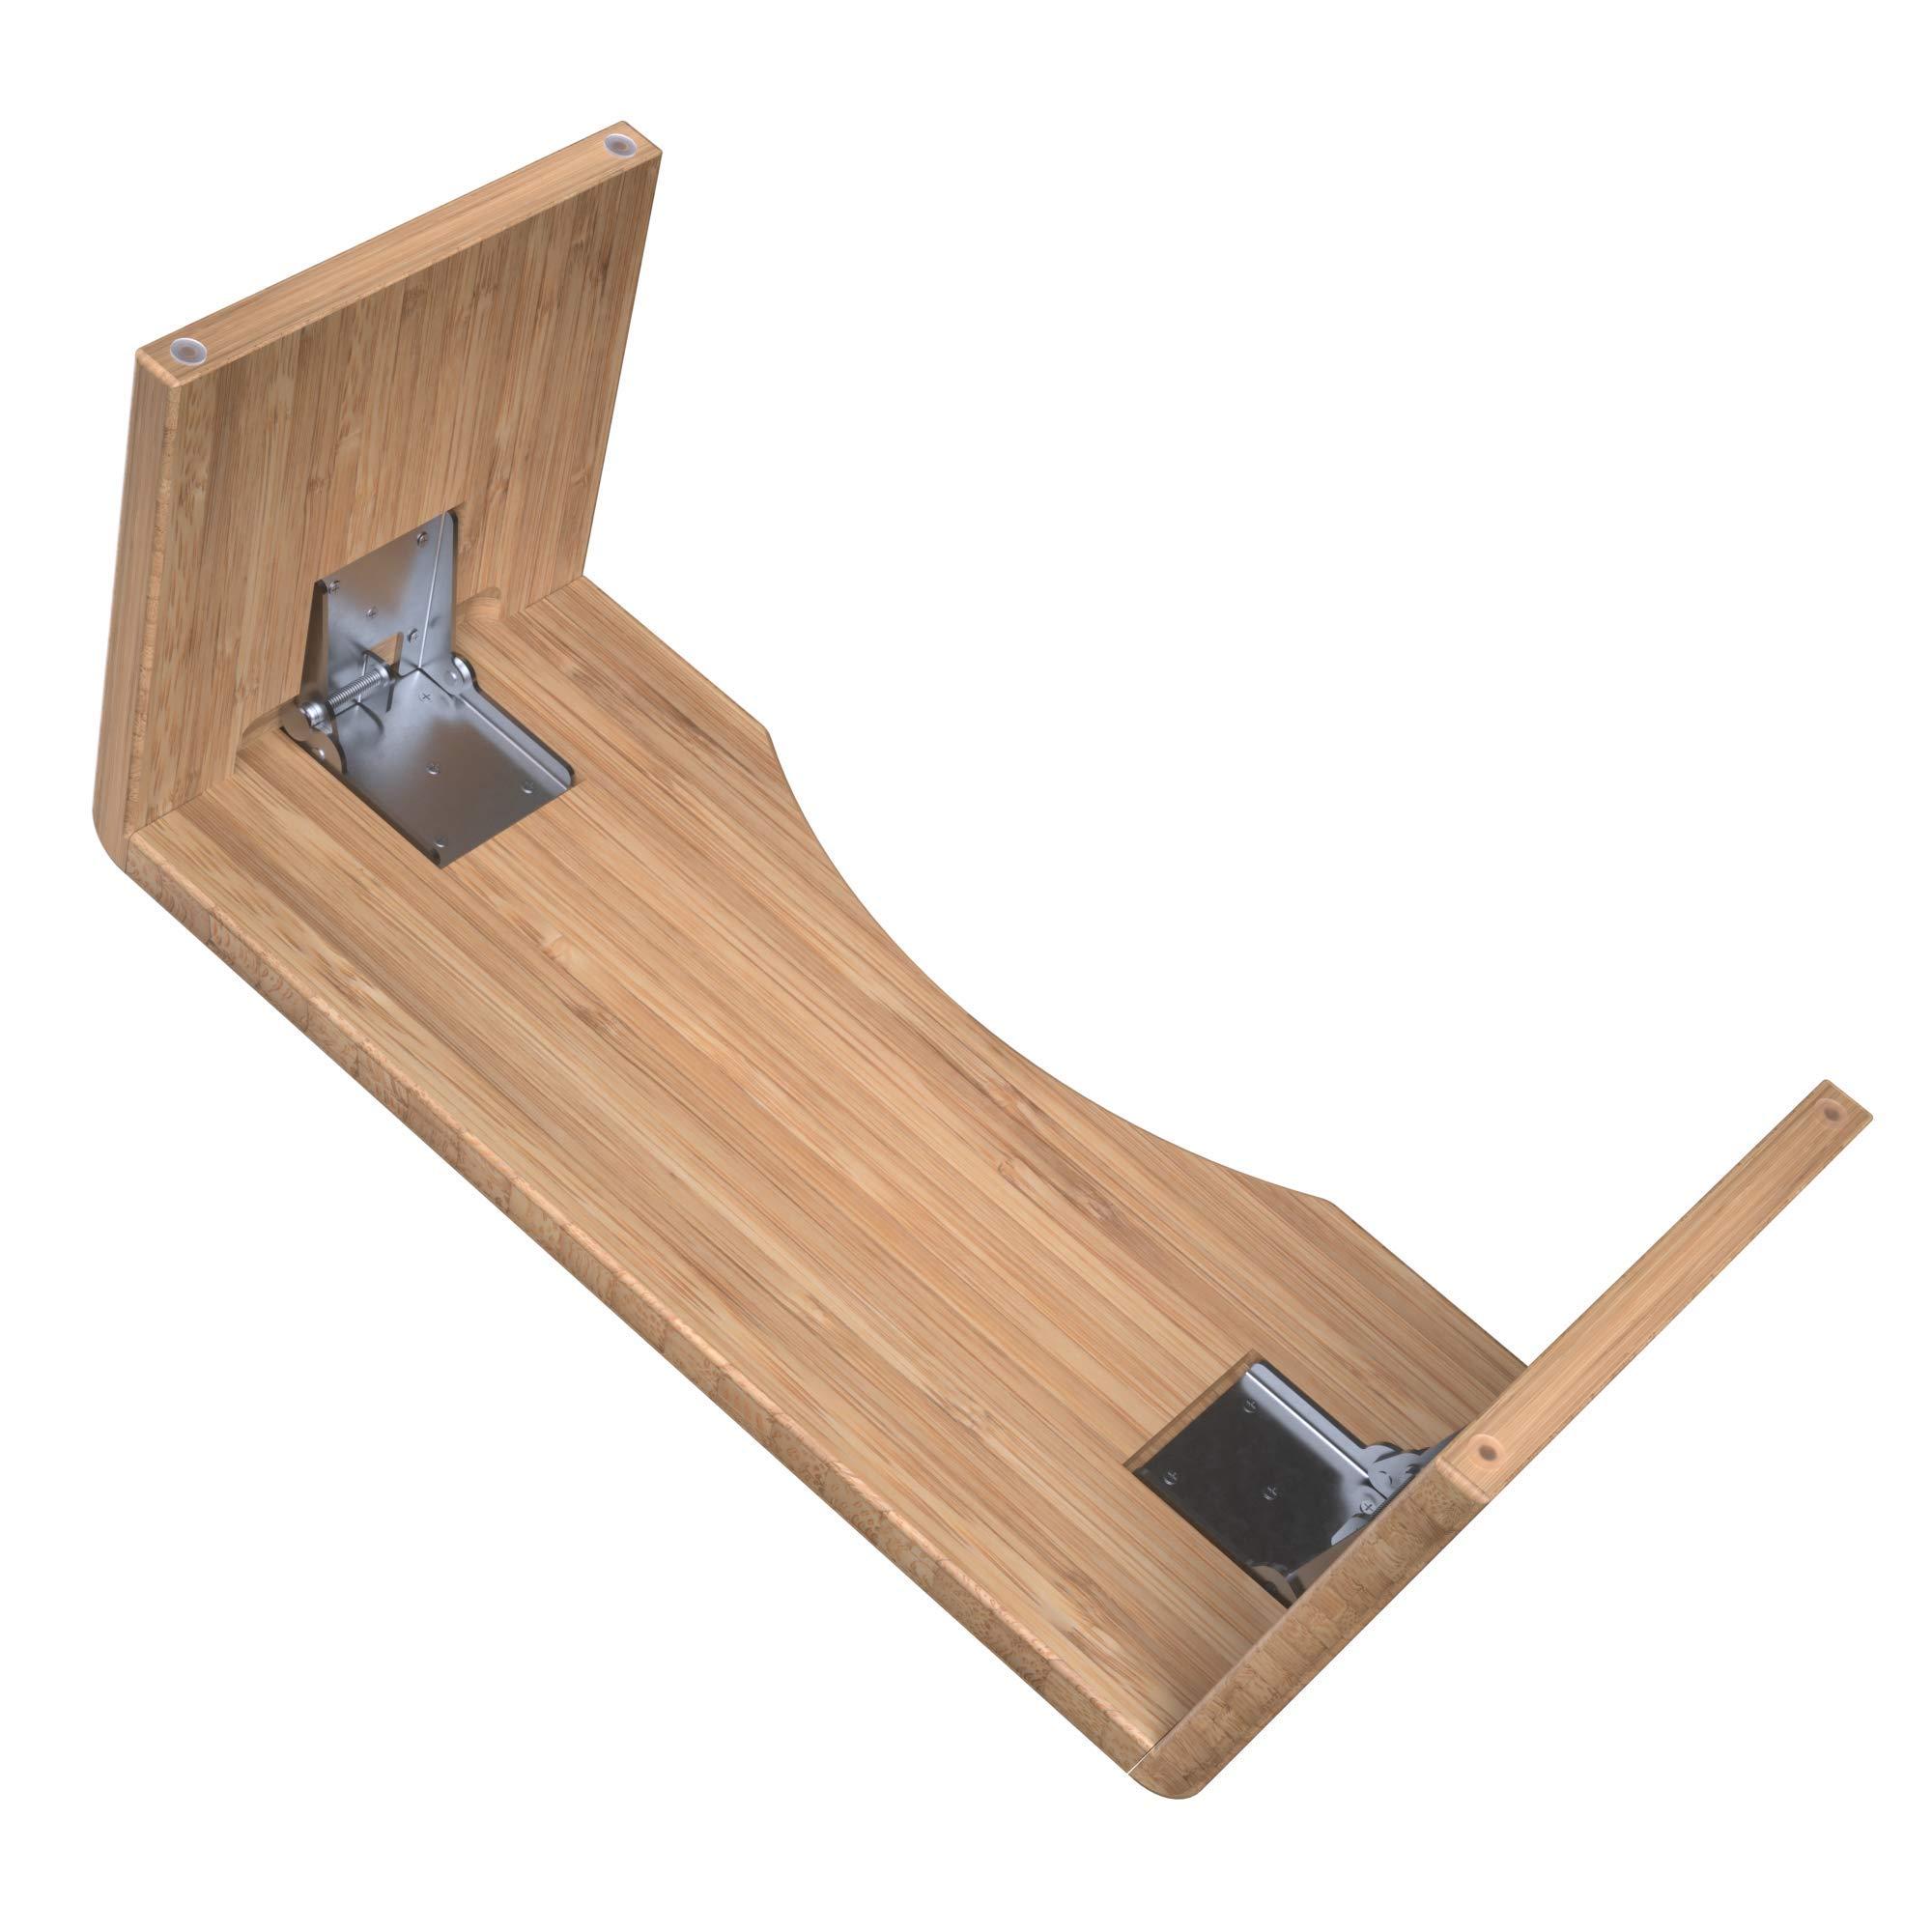 Squatty Potty Oslo Folding Bamboo Toilet Stool 7 Collapsible